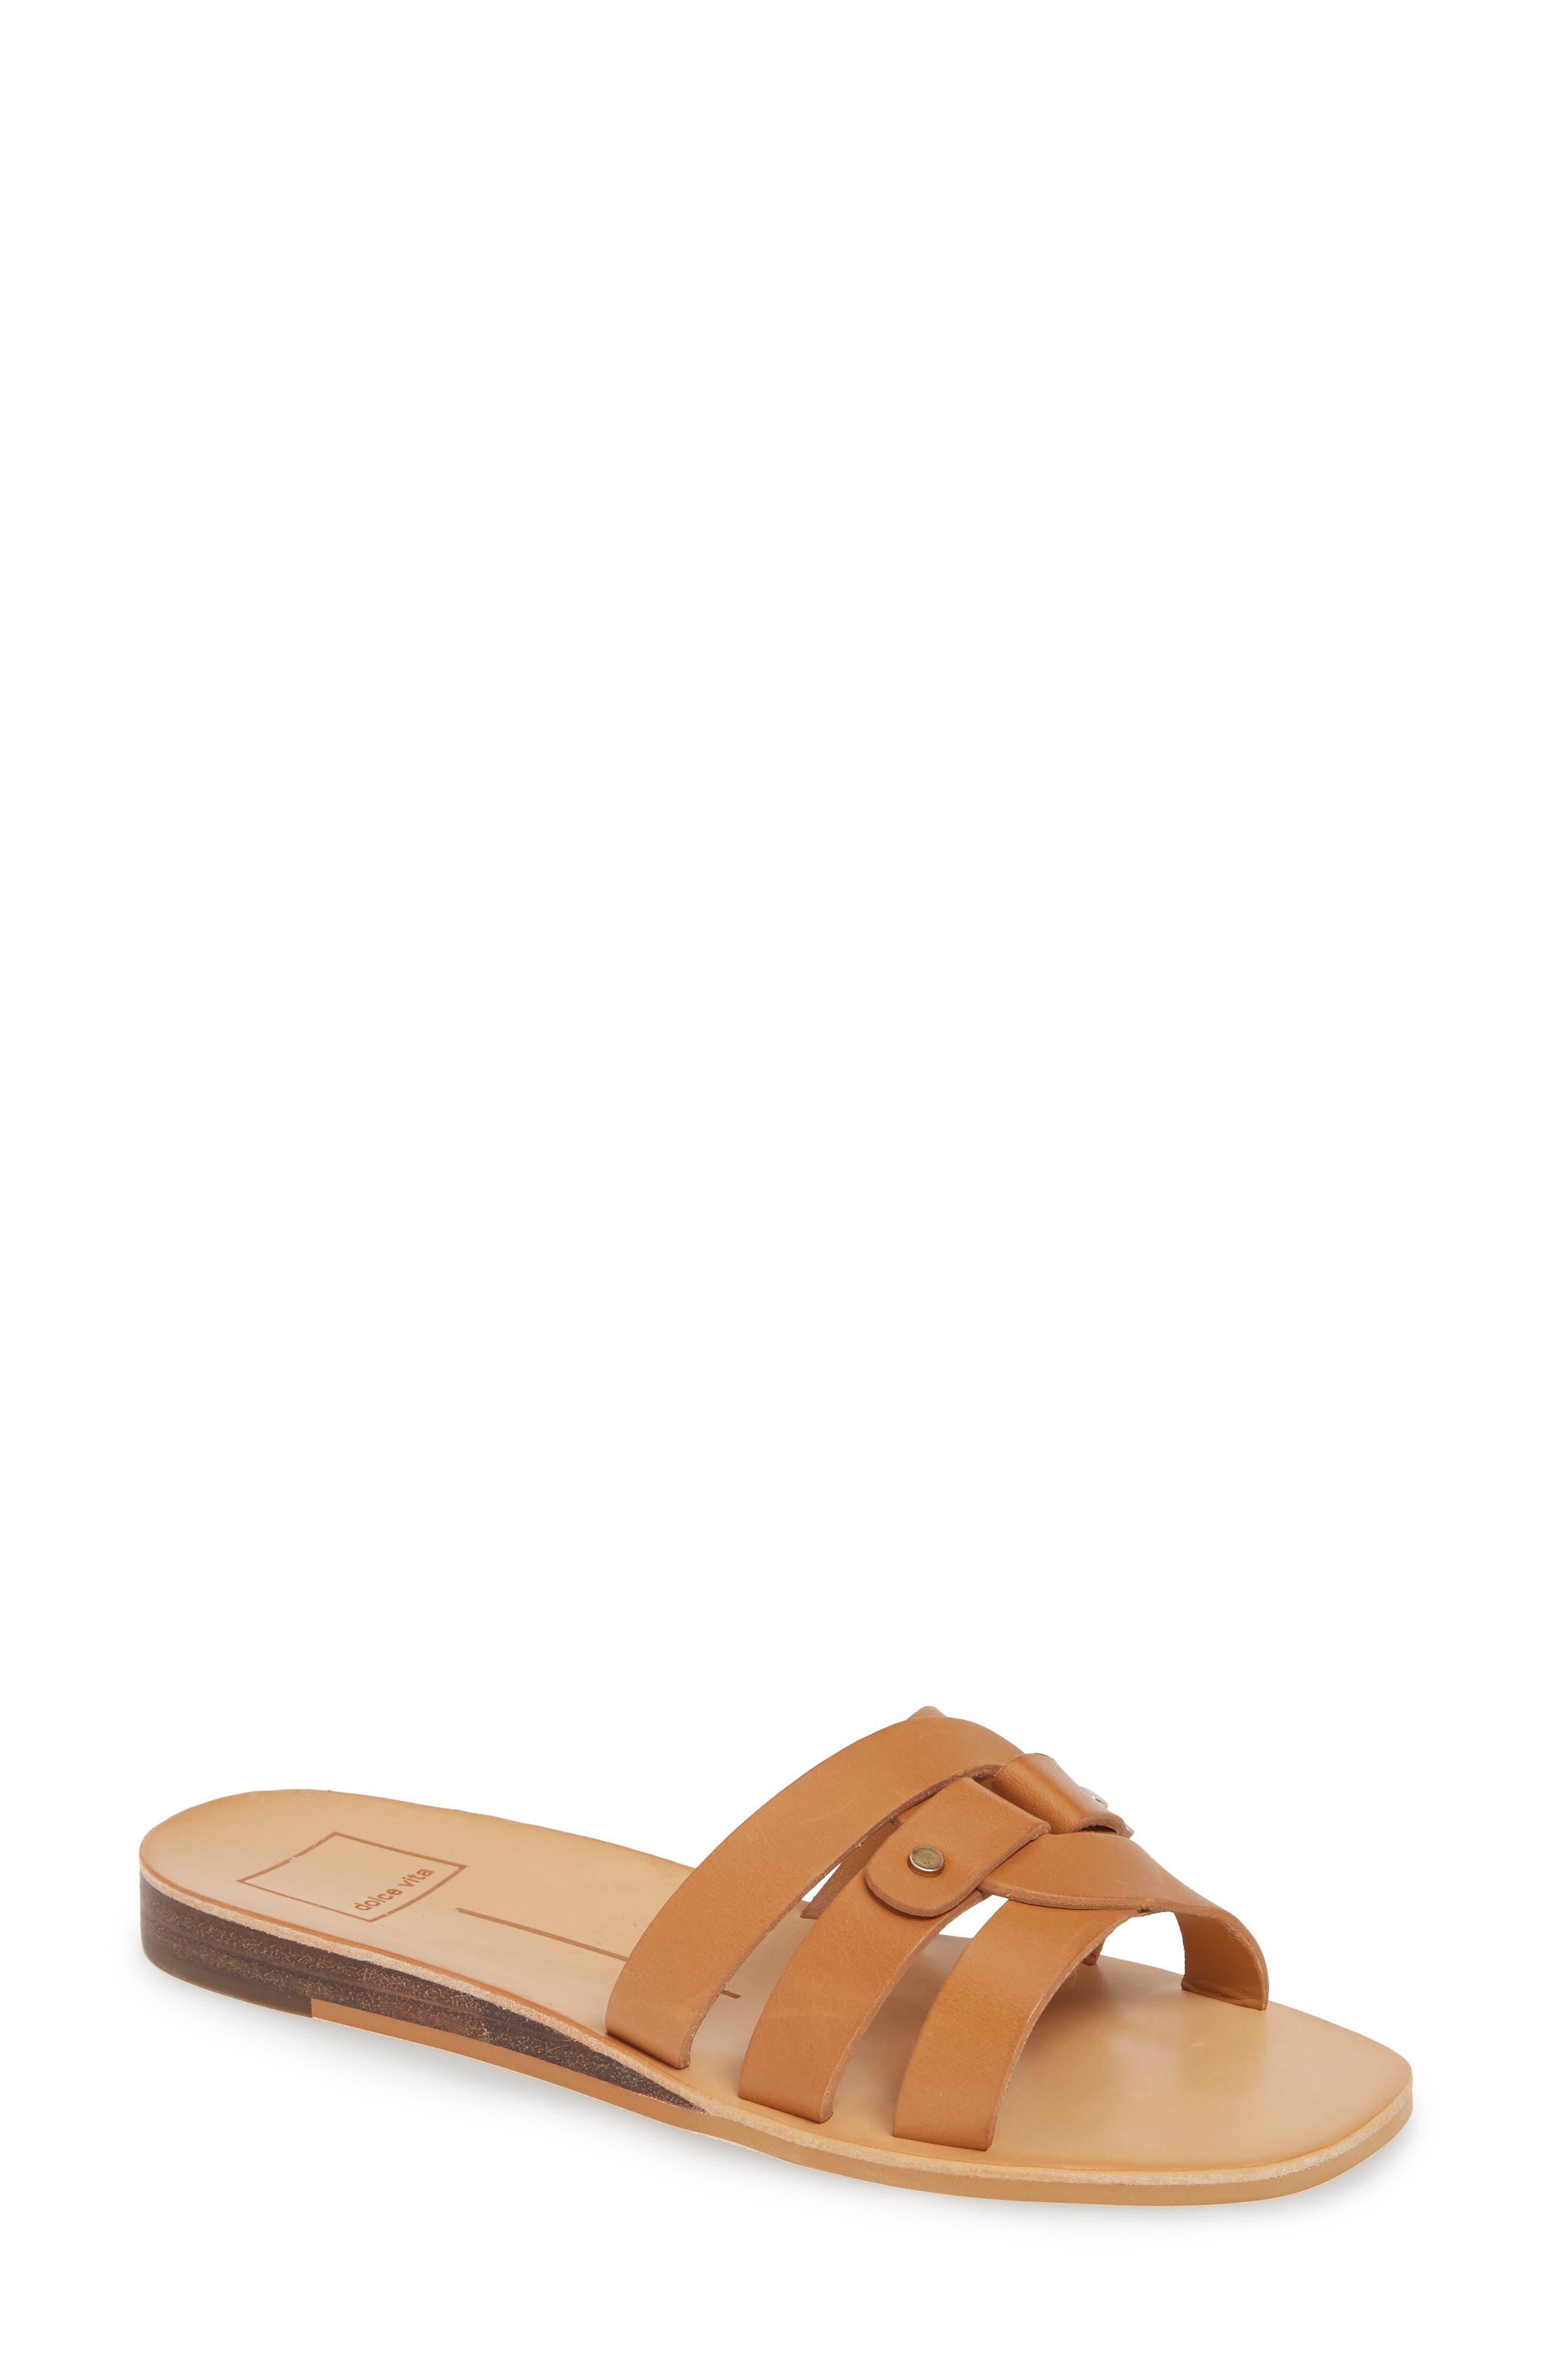 Dolce Vita Cait Slide Sandal- Brown